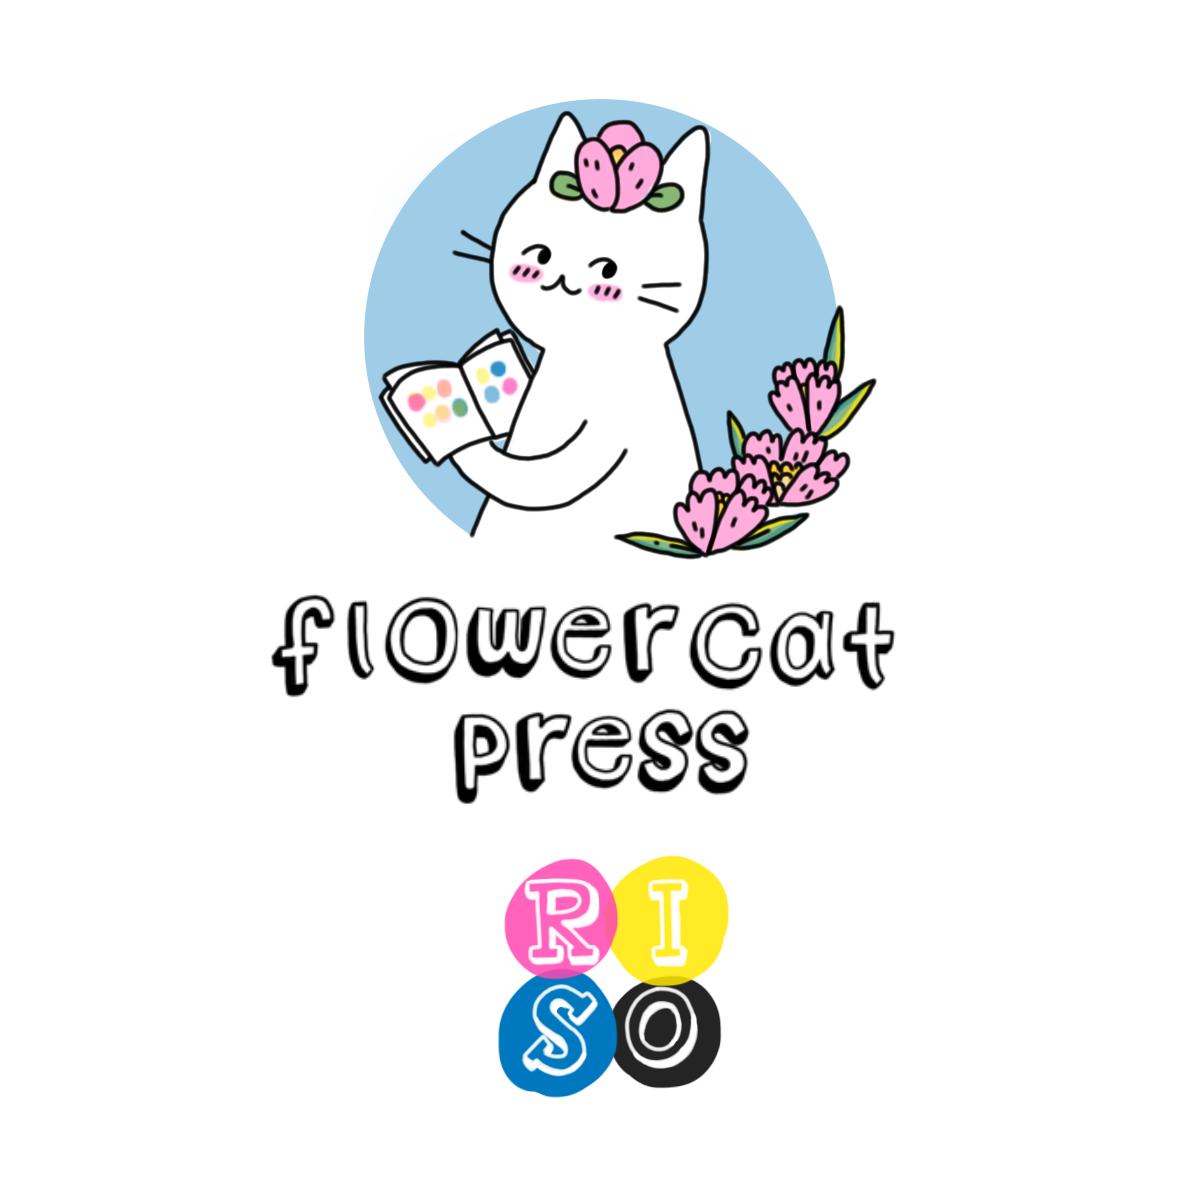 flowercat_press_logo_full.png